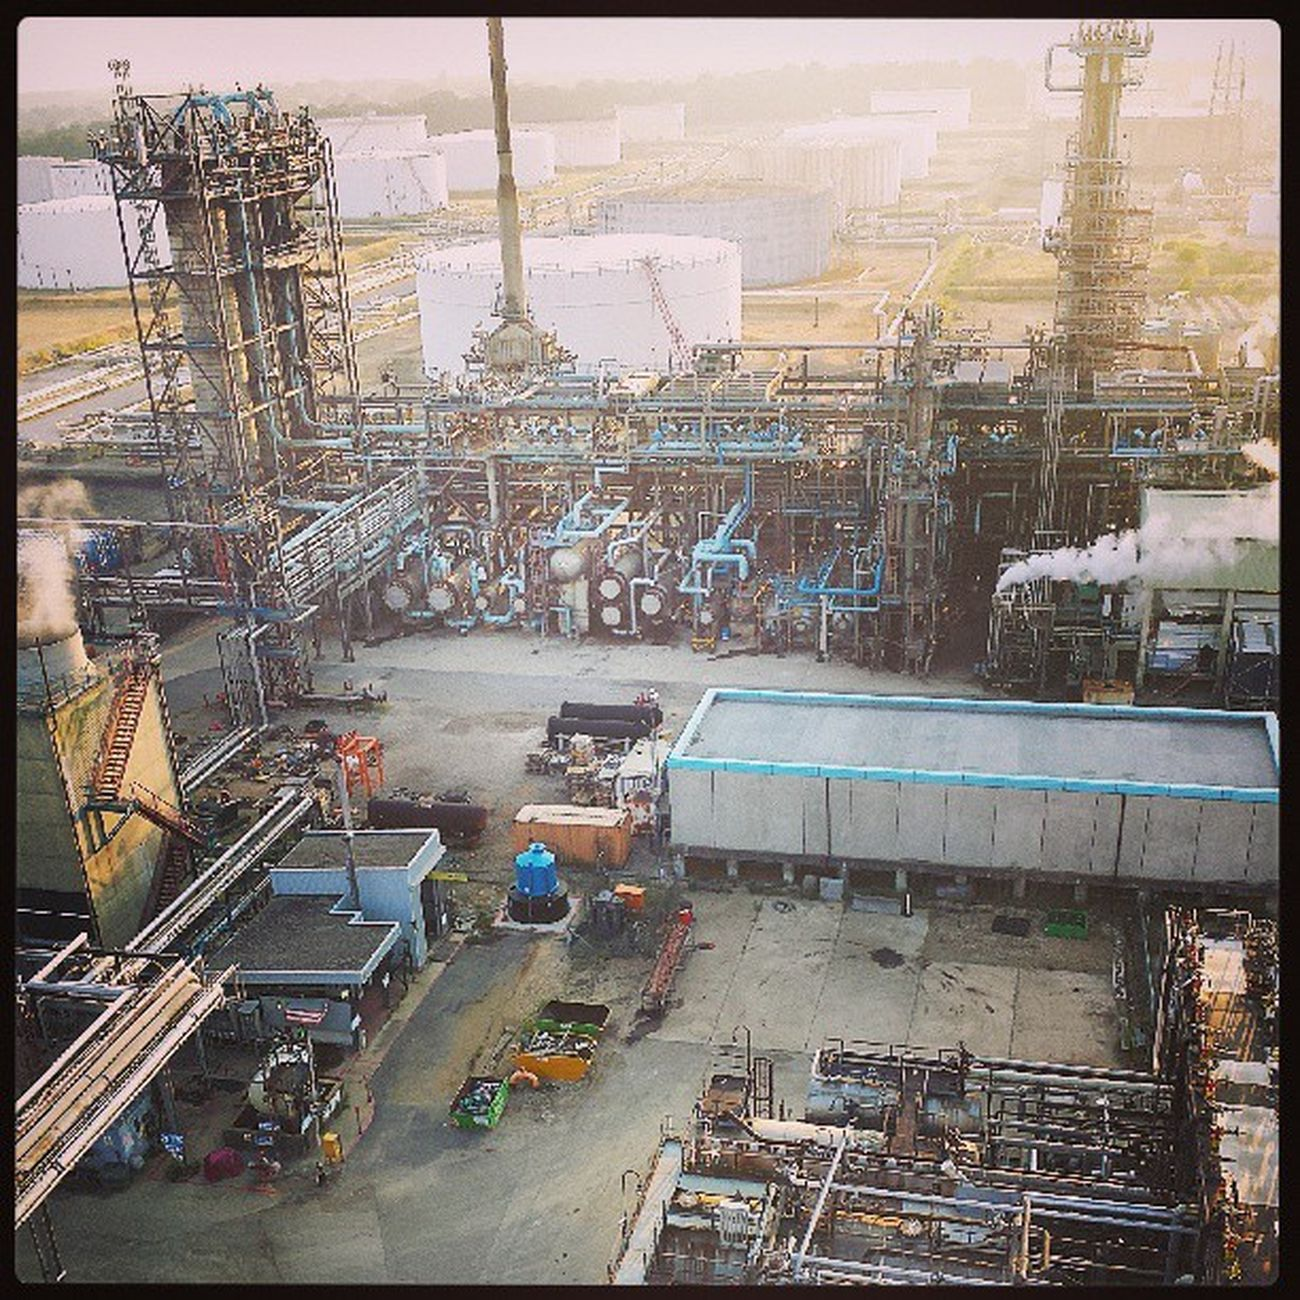 Refinery Oilgas